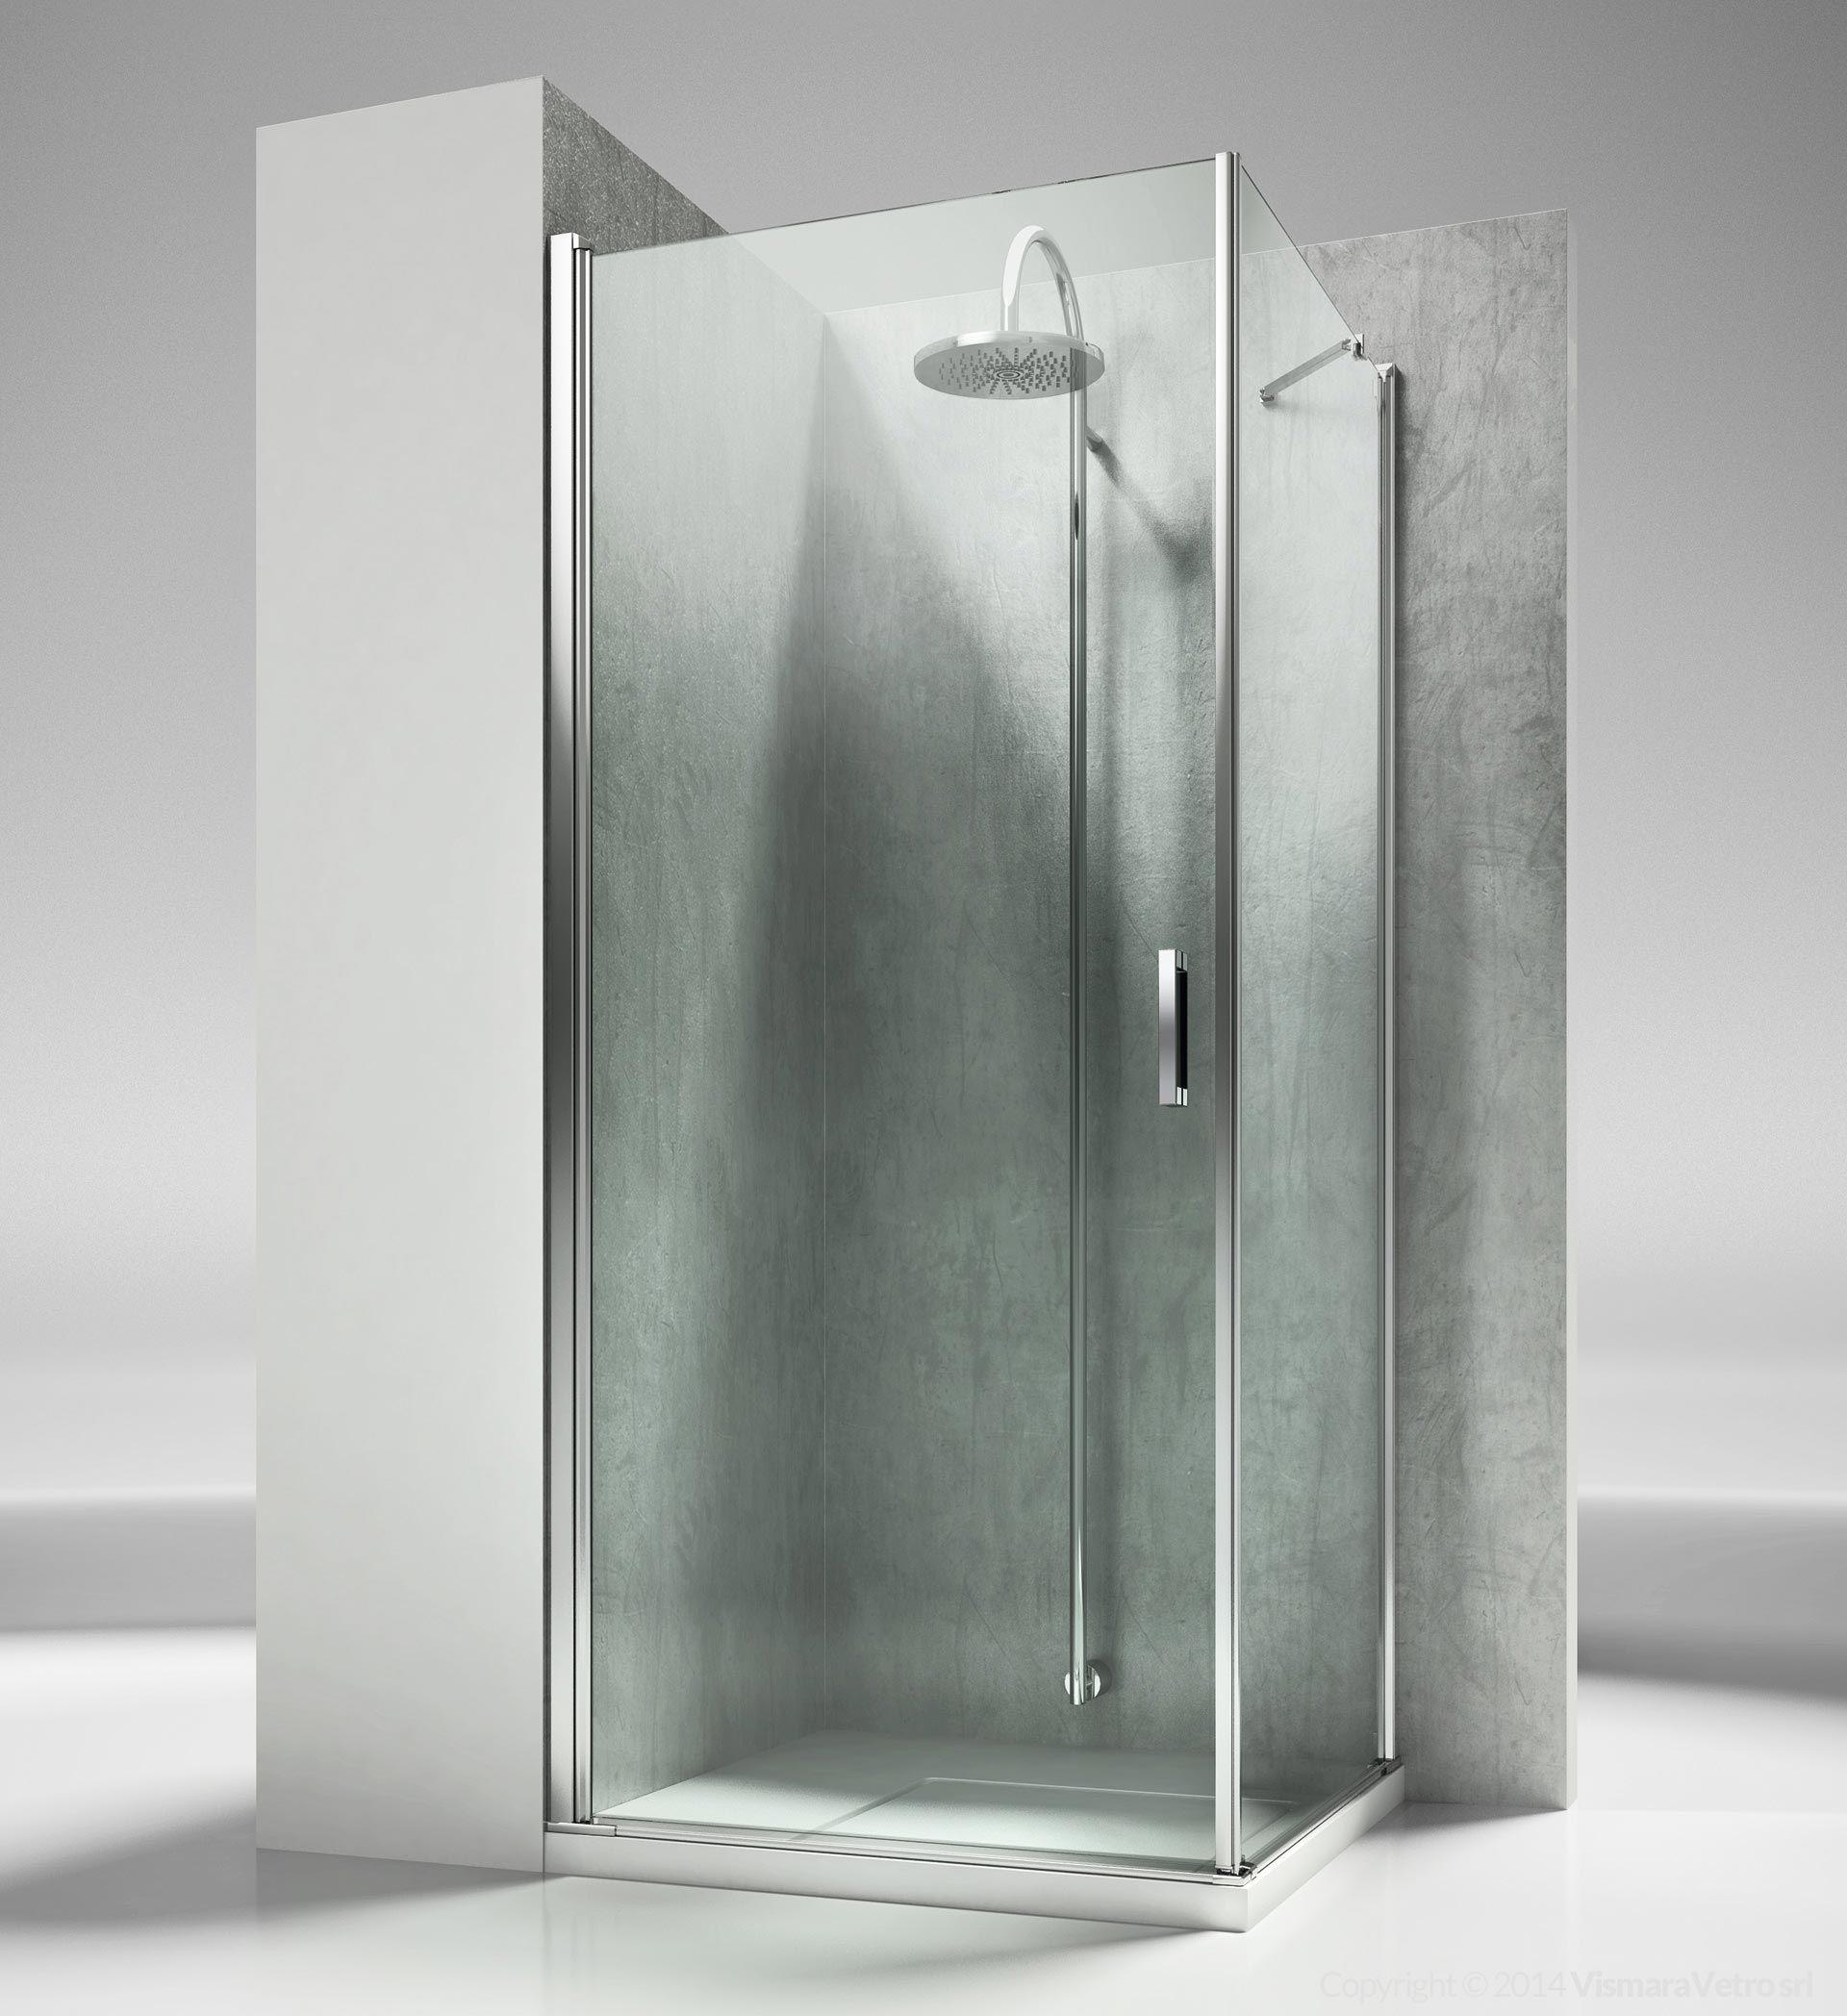 La Lf Linea Shower Enclosures Models Pivot Door Shower Enclosure Glass Shower Enclosures Shower Design